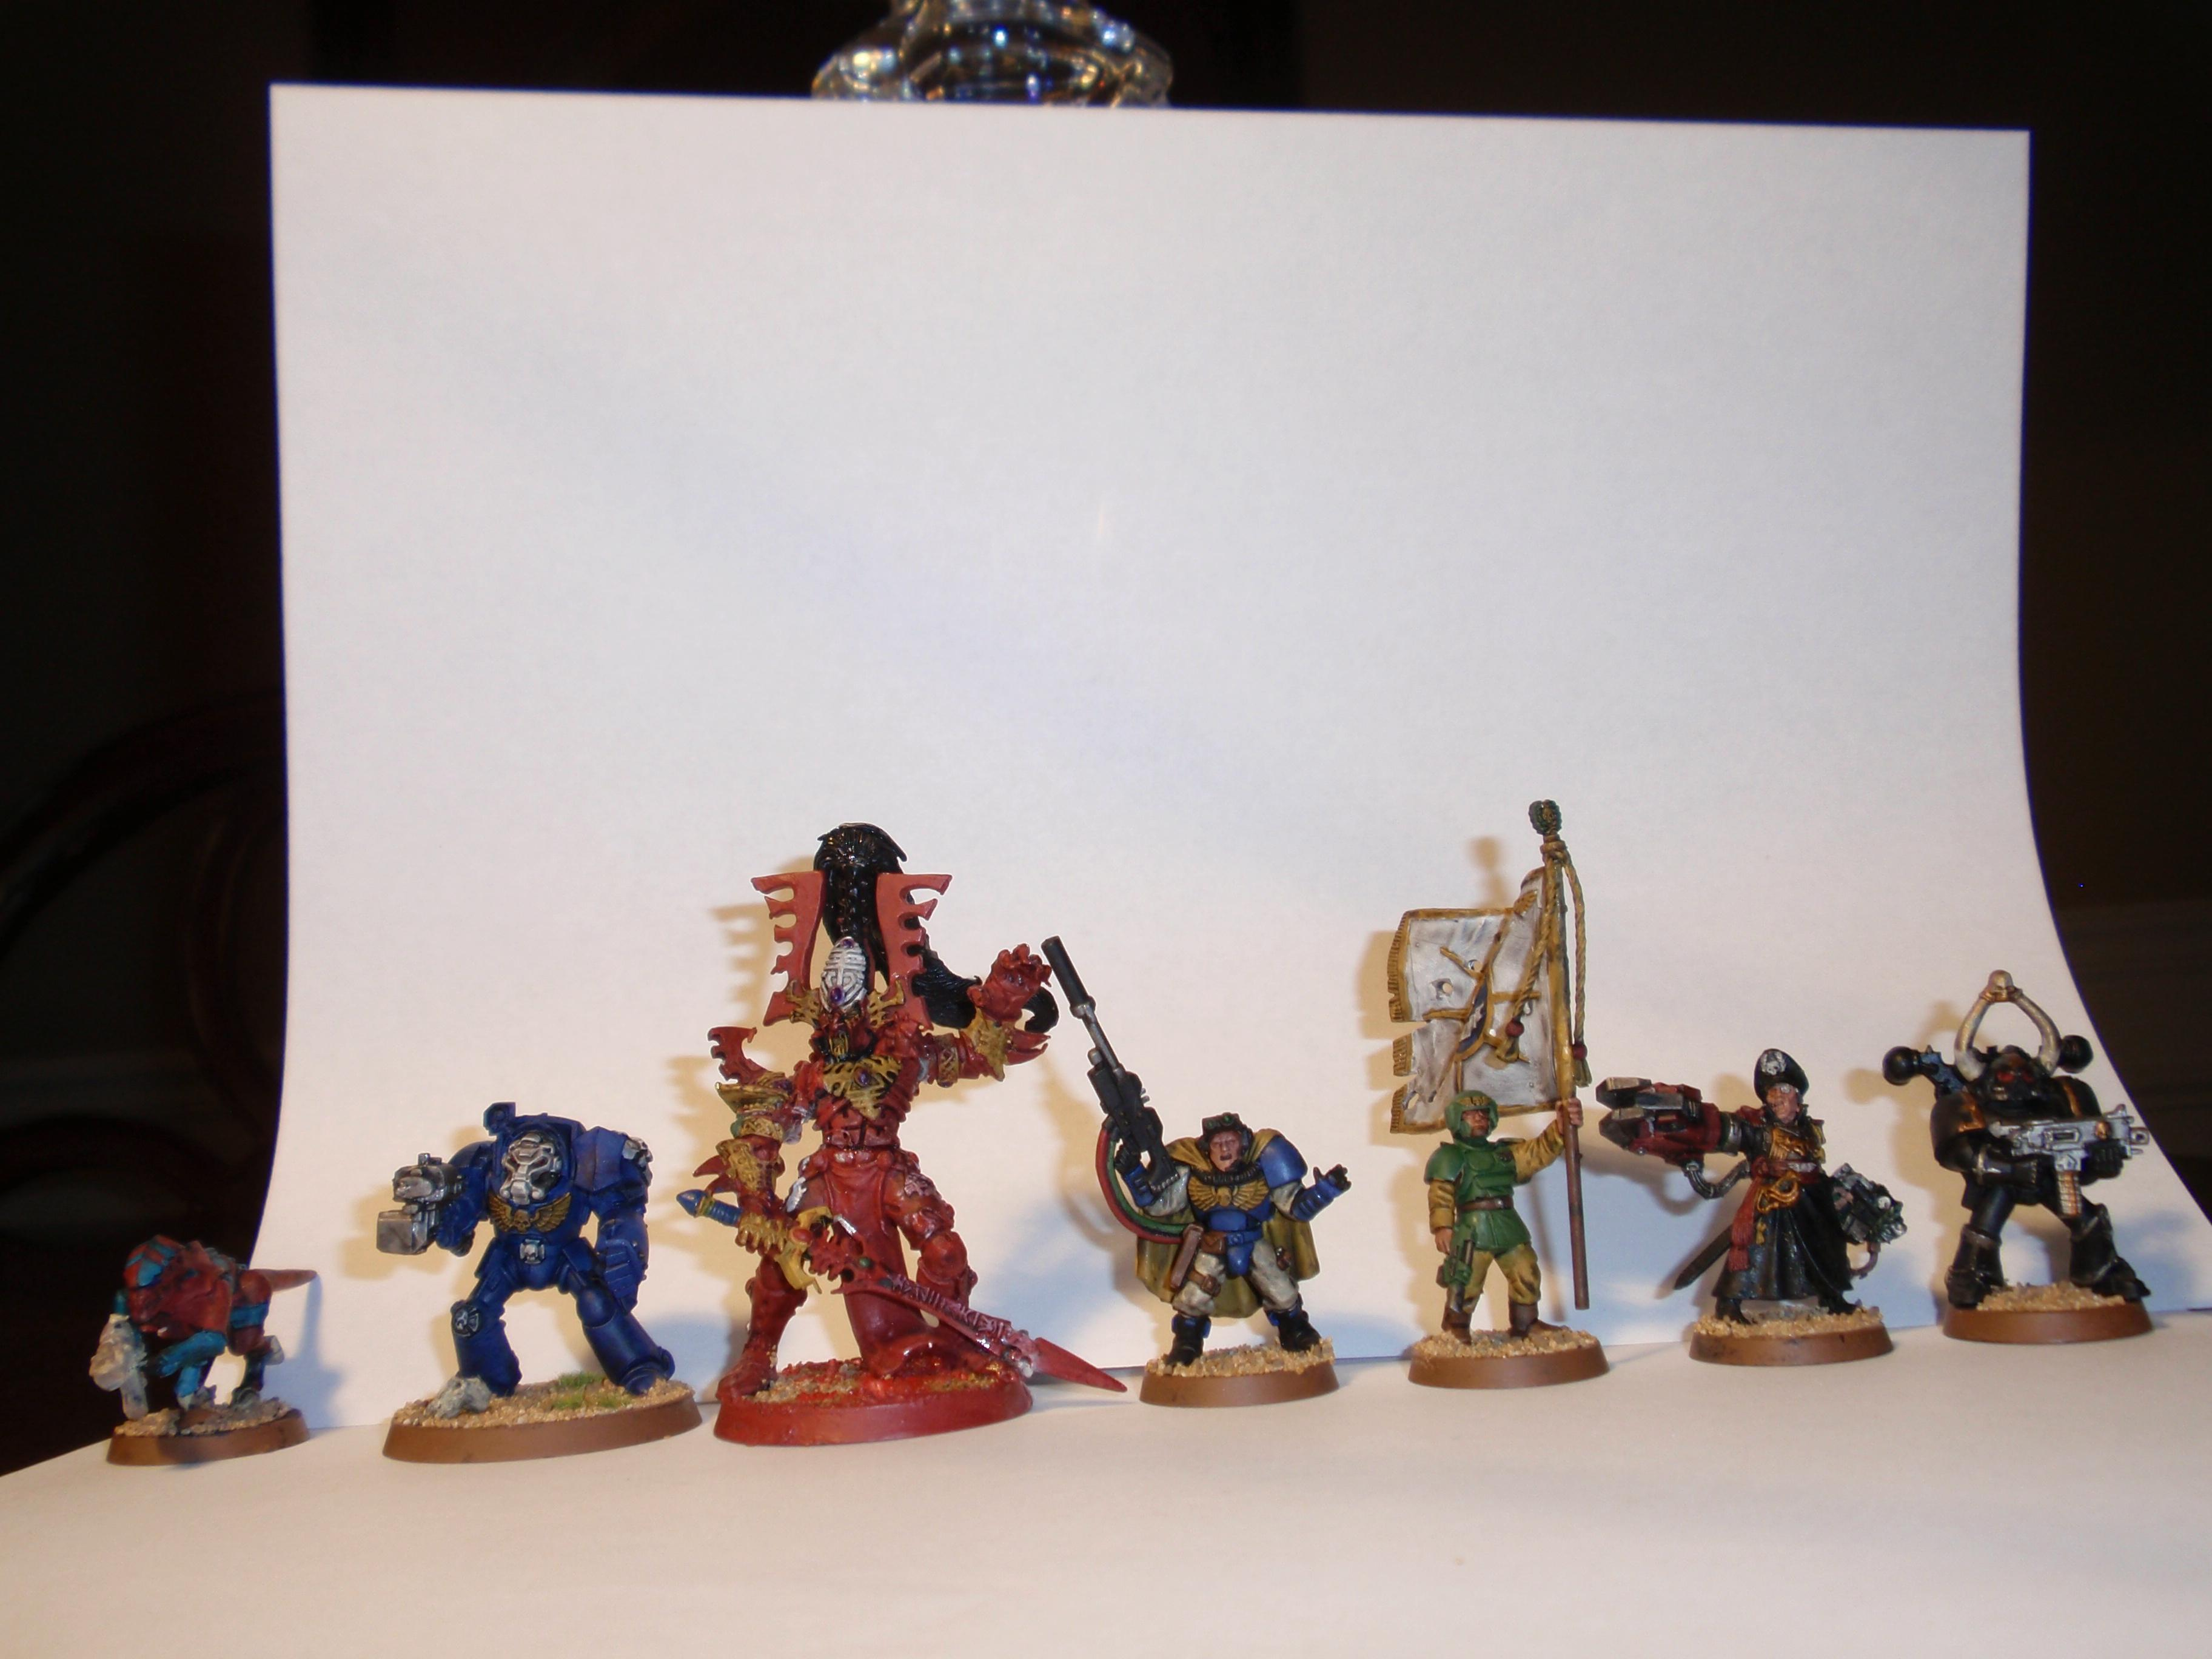 Avatar, Chaos Space Marines, Commisar Yarrick, Imperial Gurad Standard Bearer, Space Marine Scout Sergeant, Termagants, Terminator Armor